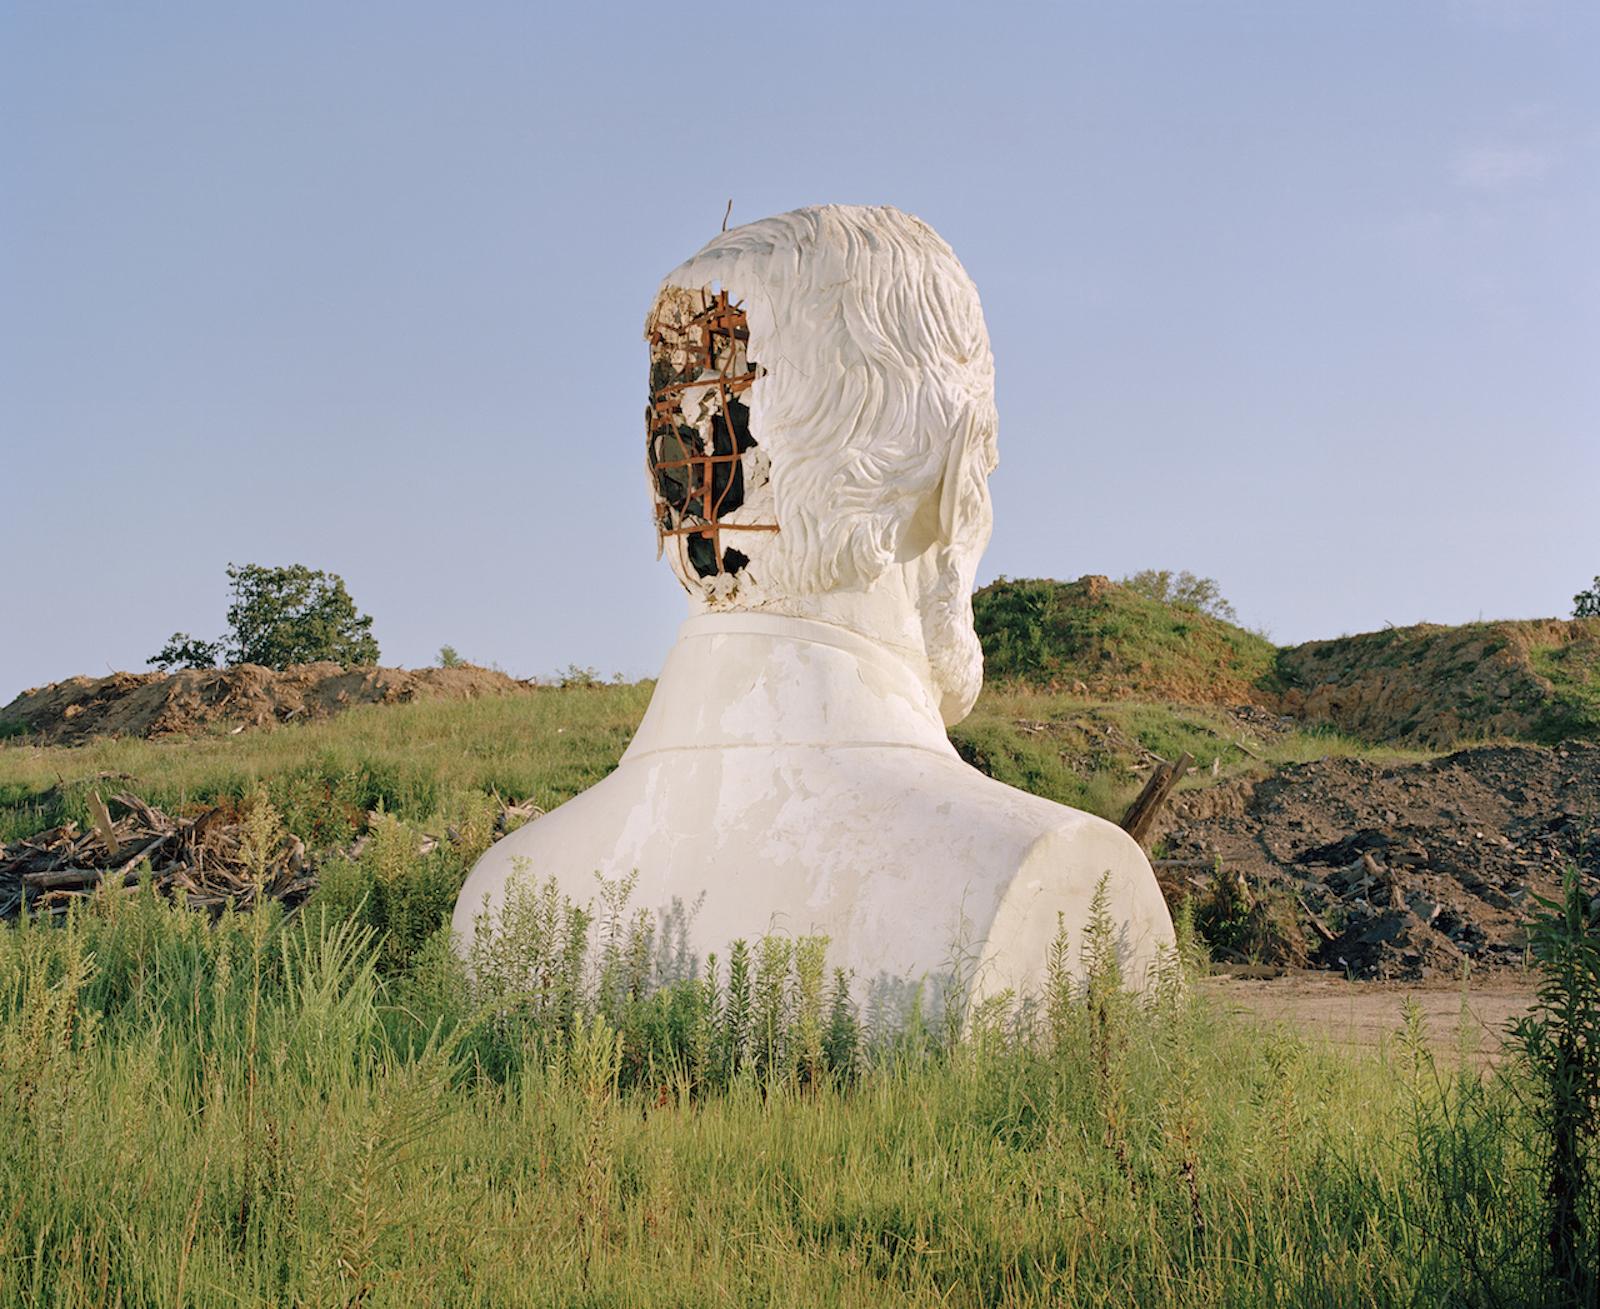 Margins Of Excess, l'America vista da Max Pinckers   Collater.al